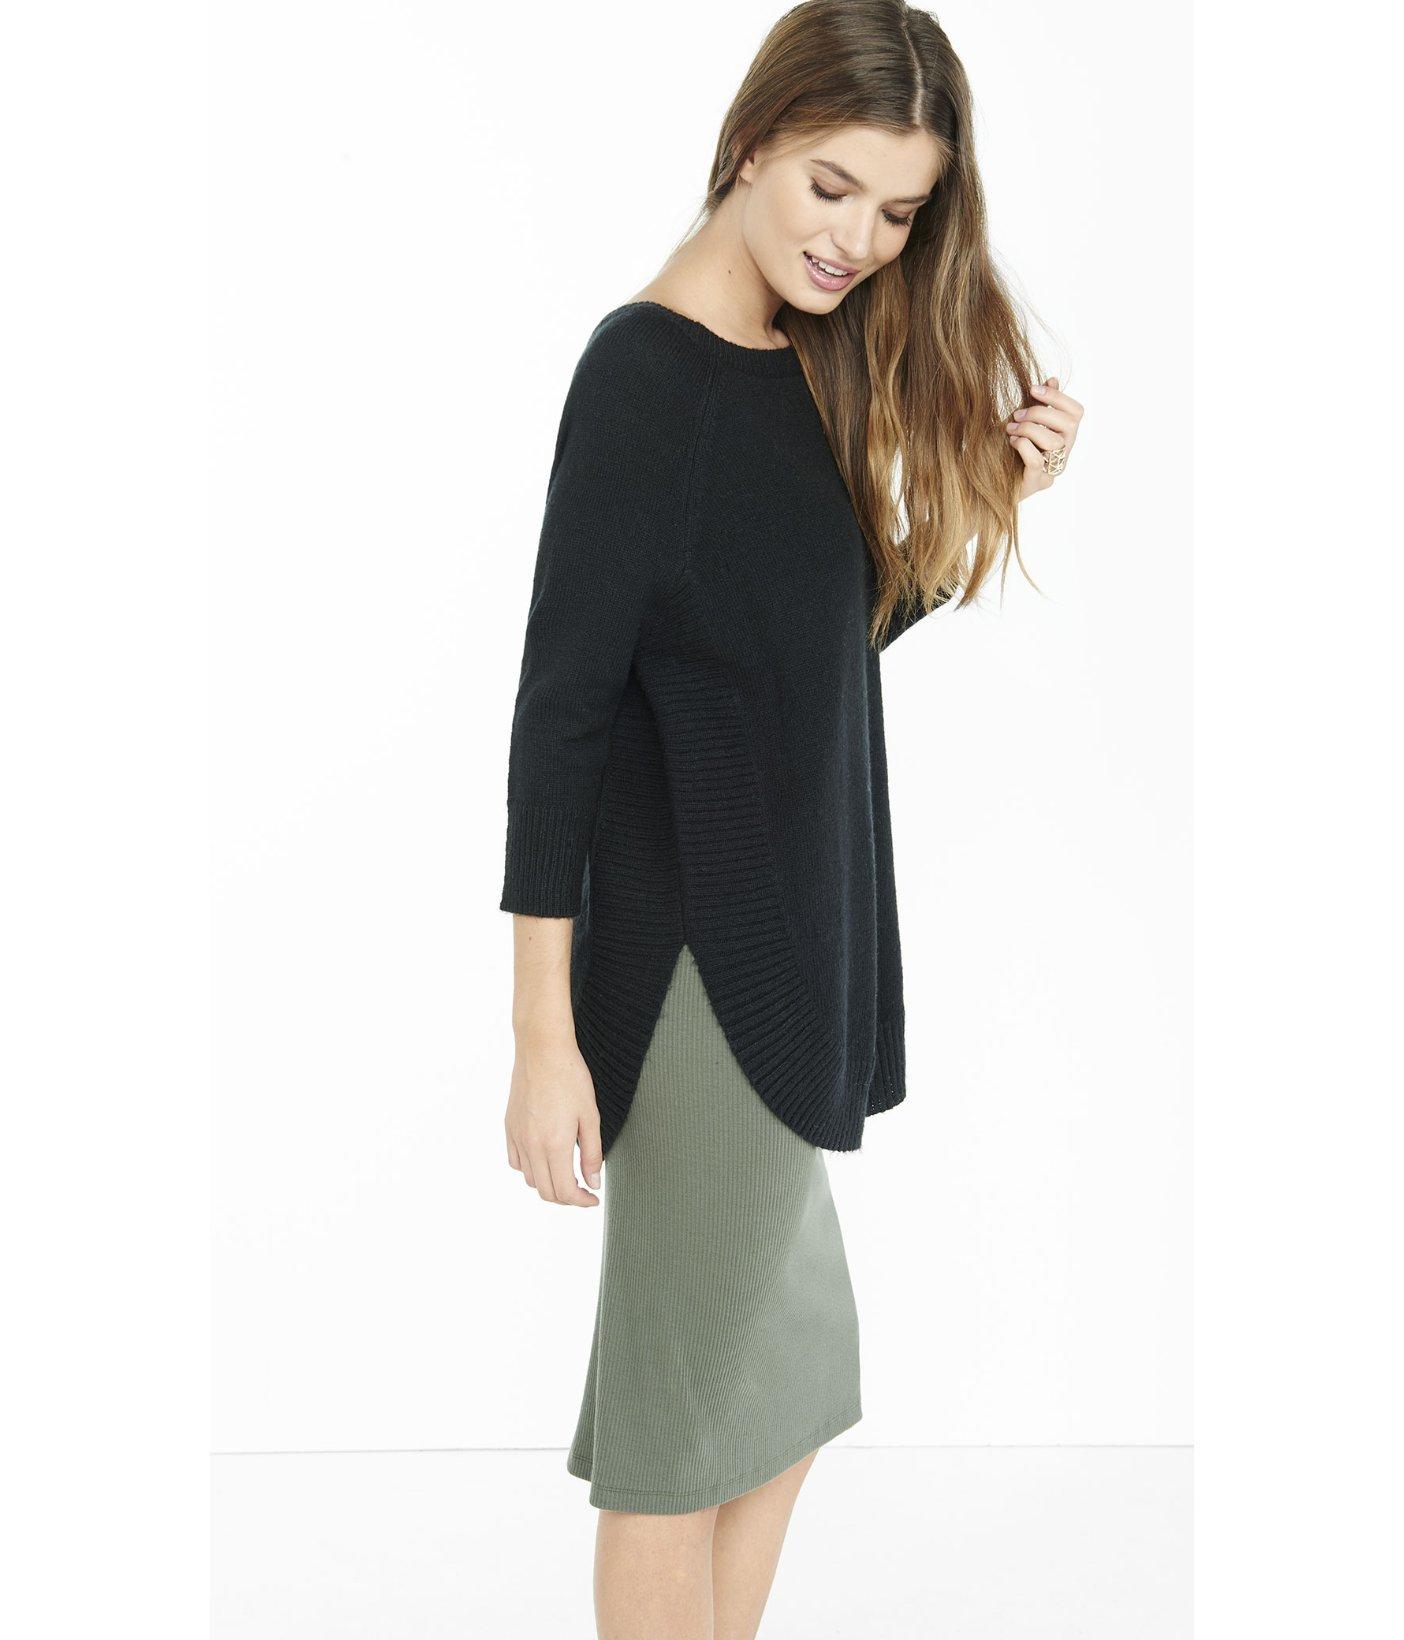 24c0b3311 Lyst - Express Black Boucle Extreme Circle Hem Tunic Sweater in Black